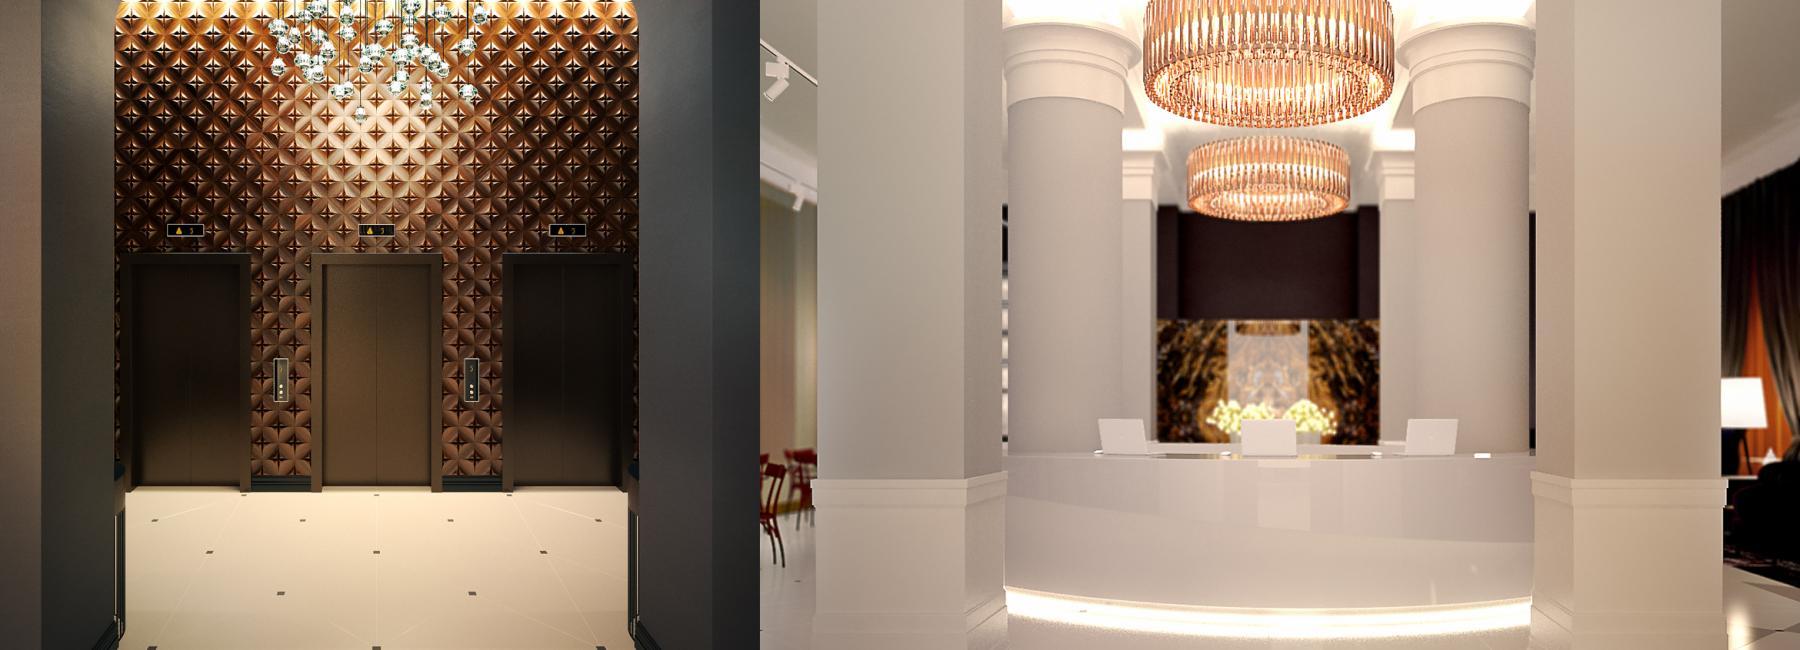 hotel_oktiabrskaya_hotel_design_lwa